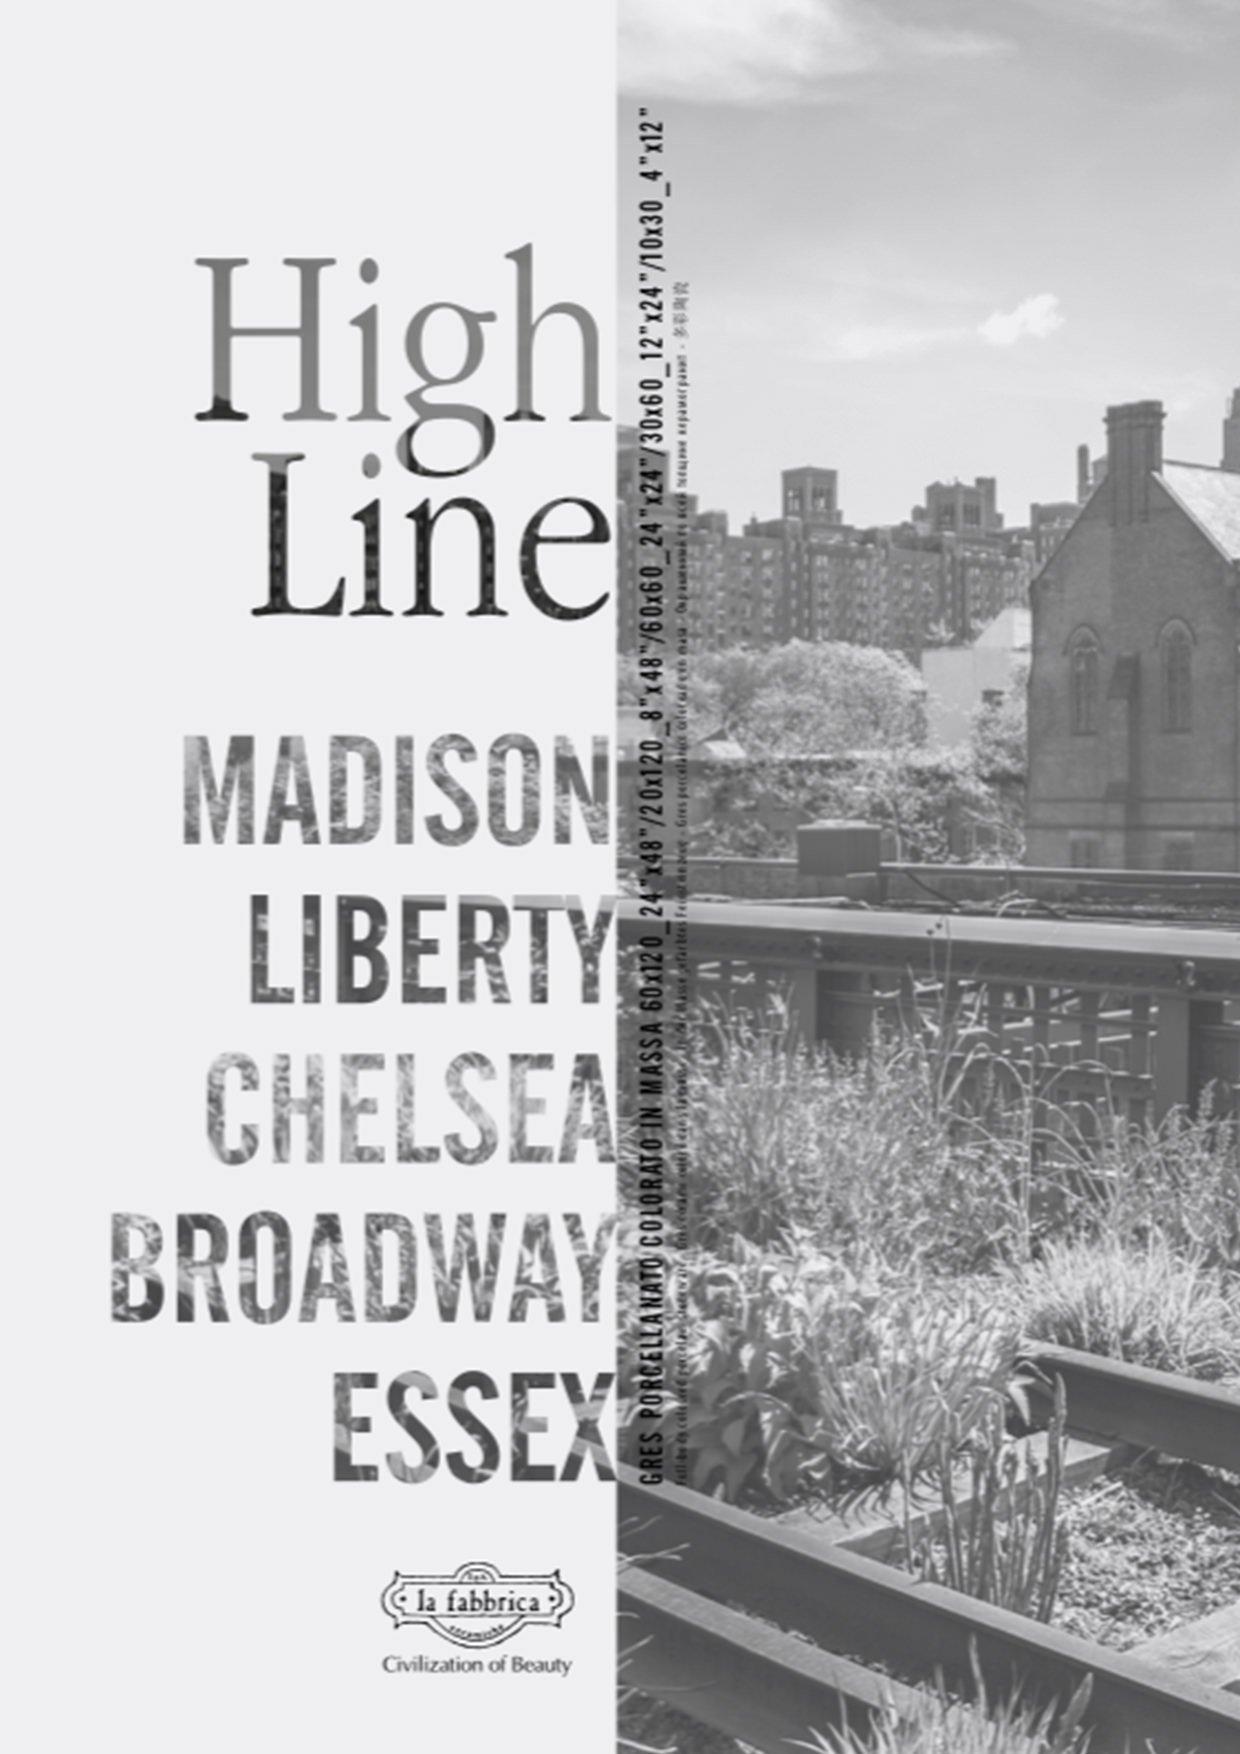 La Fabbrica Catalogo HighLine